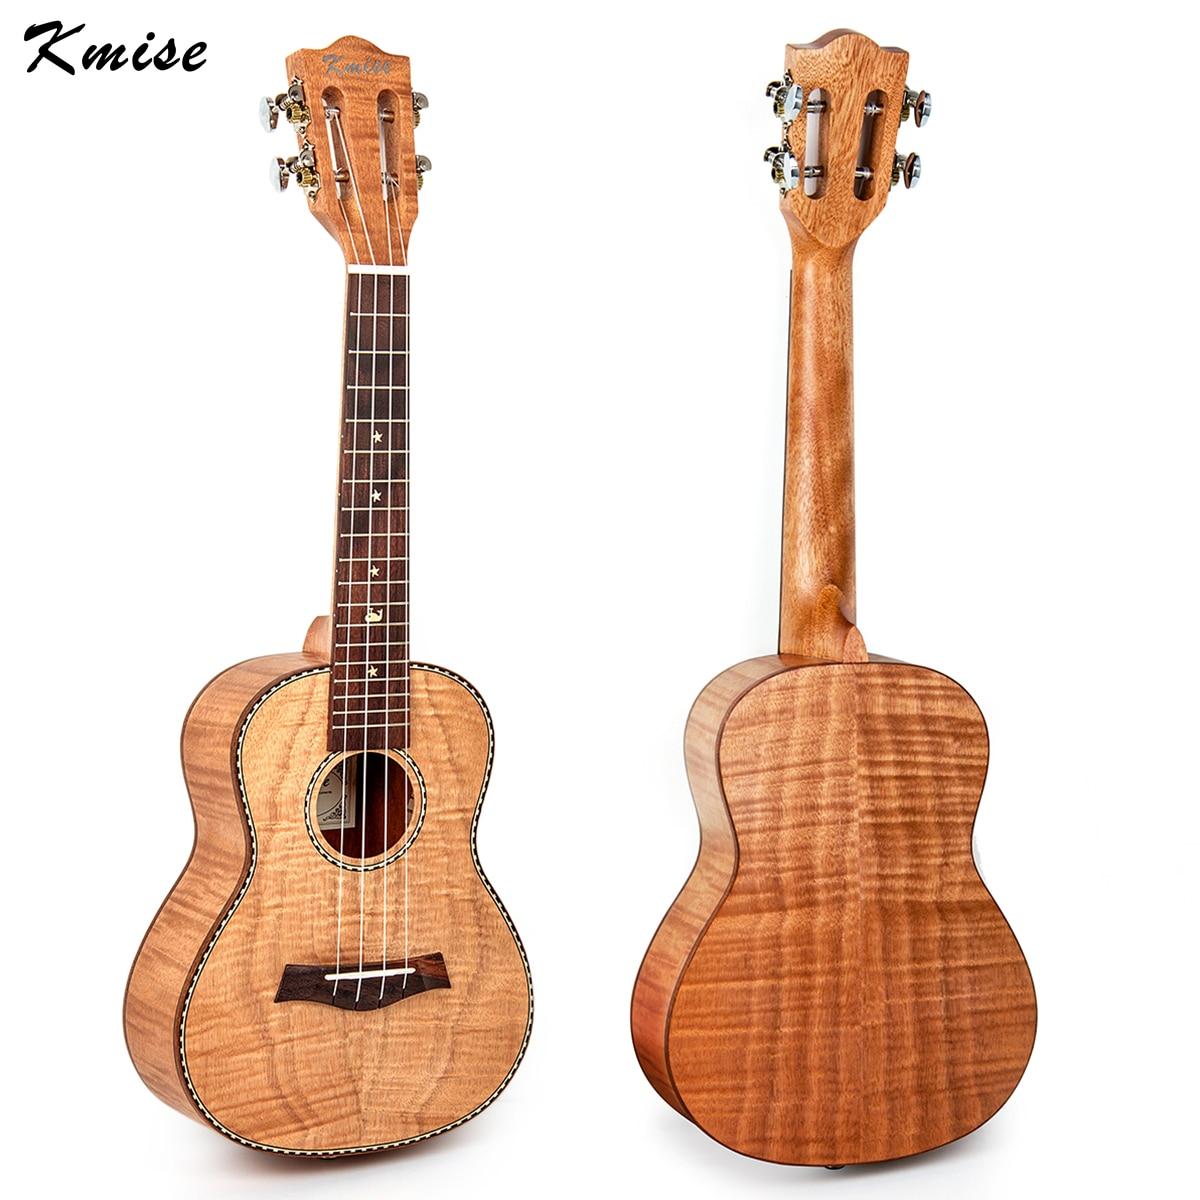 Kmise Concert Ukulele Tiger Flame Okoume Classical Guitar Head 23 Inch Ukelele Ukelele 4 String Hawaii Guitar